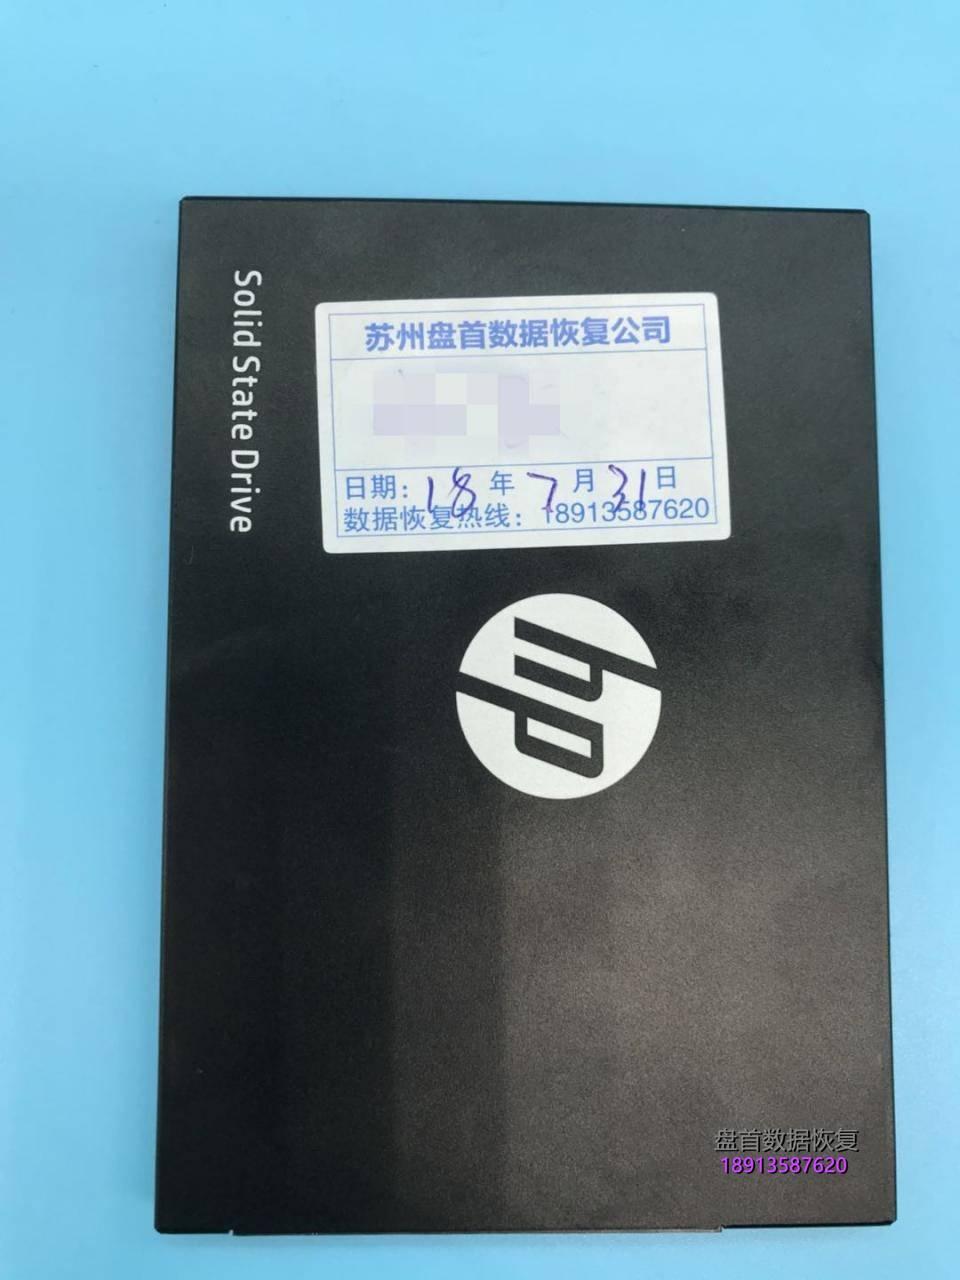 hp-s700电脑不识别hp-ssd固态硬盘数据恢复成功主控型号sm2258芯-12 hp s700电脑不识别HP SSD固态硬盘数据恢复成功主控型号SM2258芯片